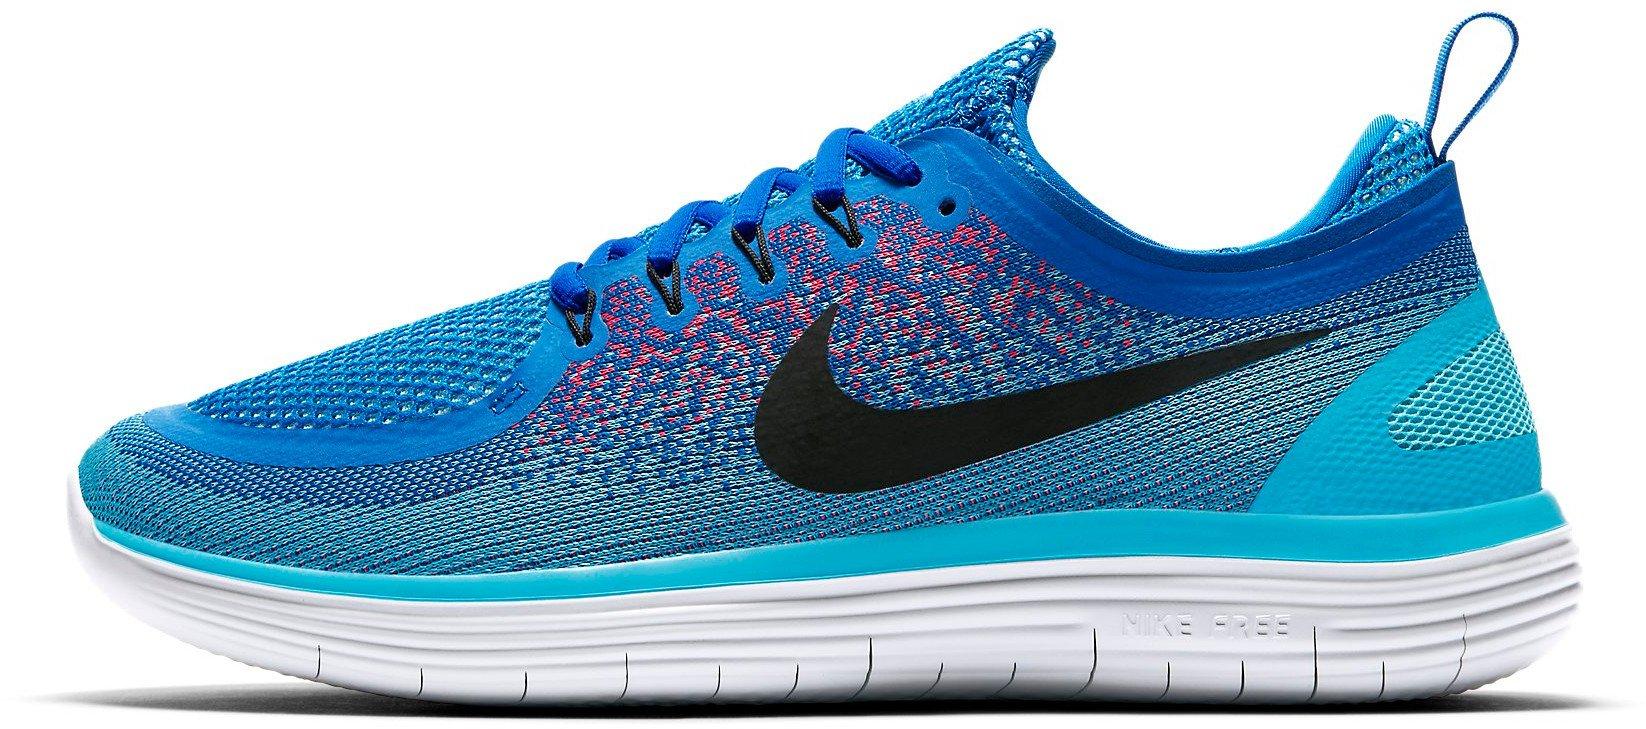 Janice márketing pájaro  Running shoes Nike FREE RN DISTANCE 2 - Top4Football.com